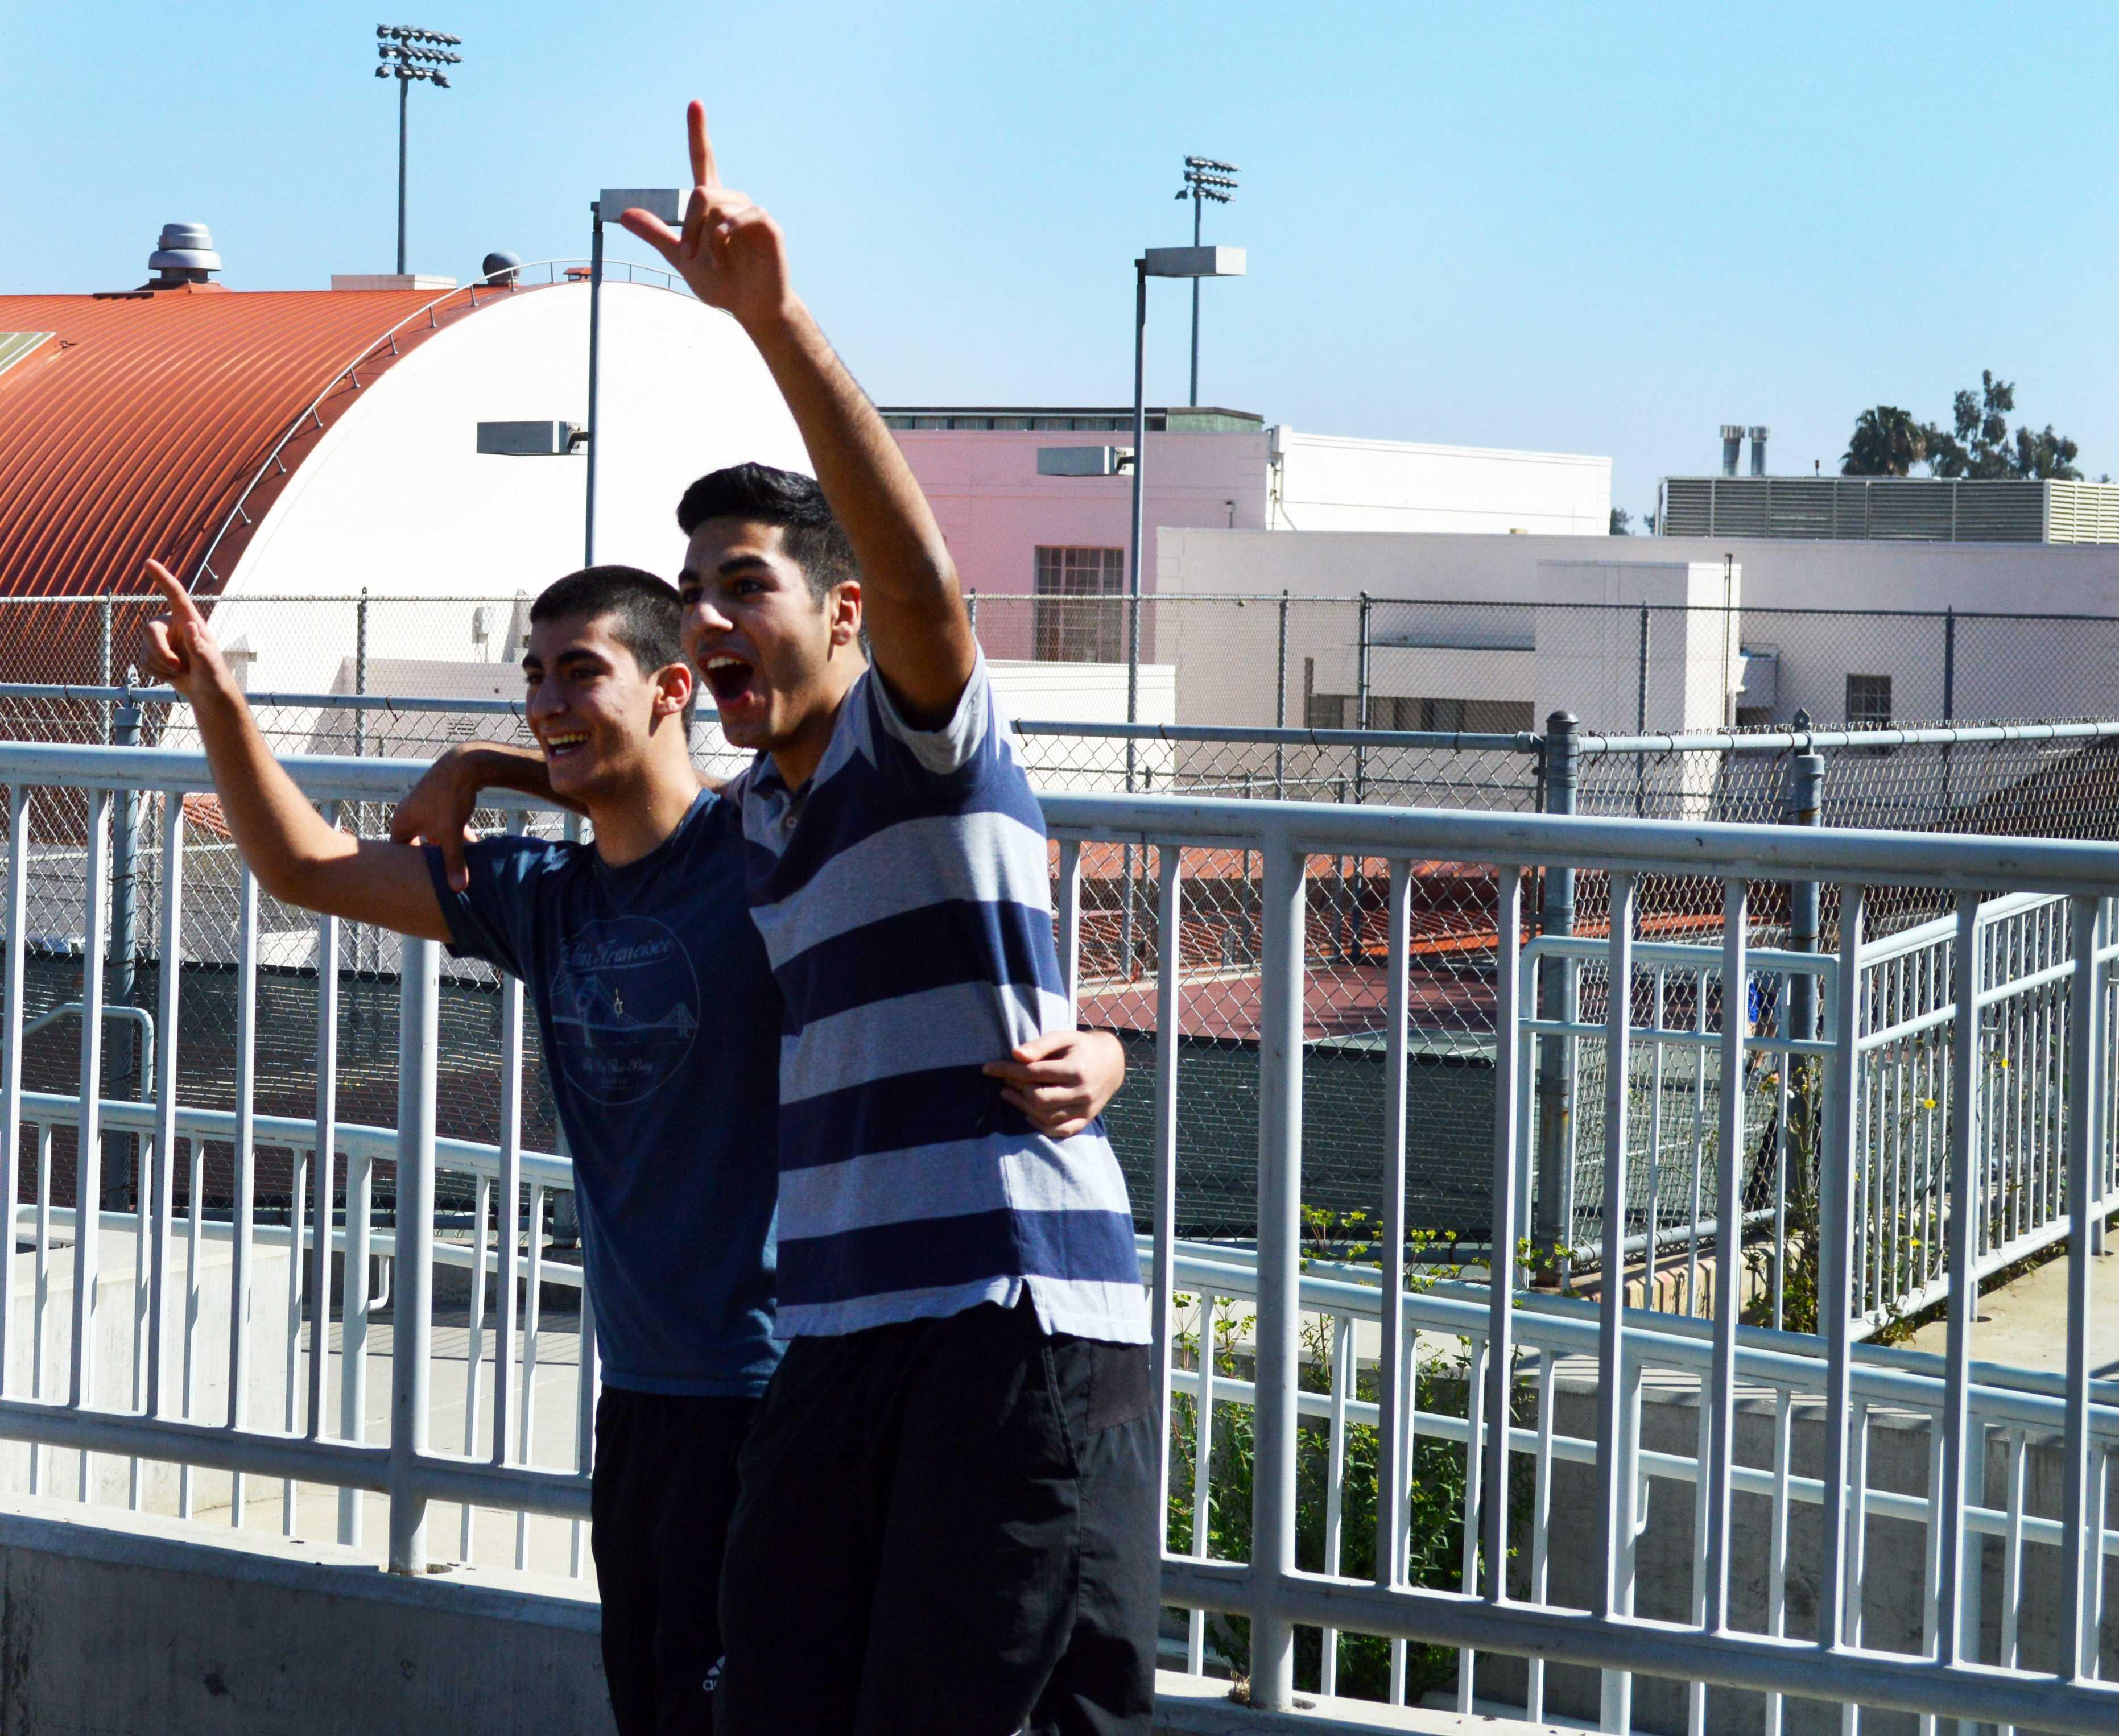 Juniors rejoice after winning the three-legged race.